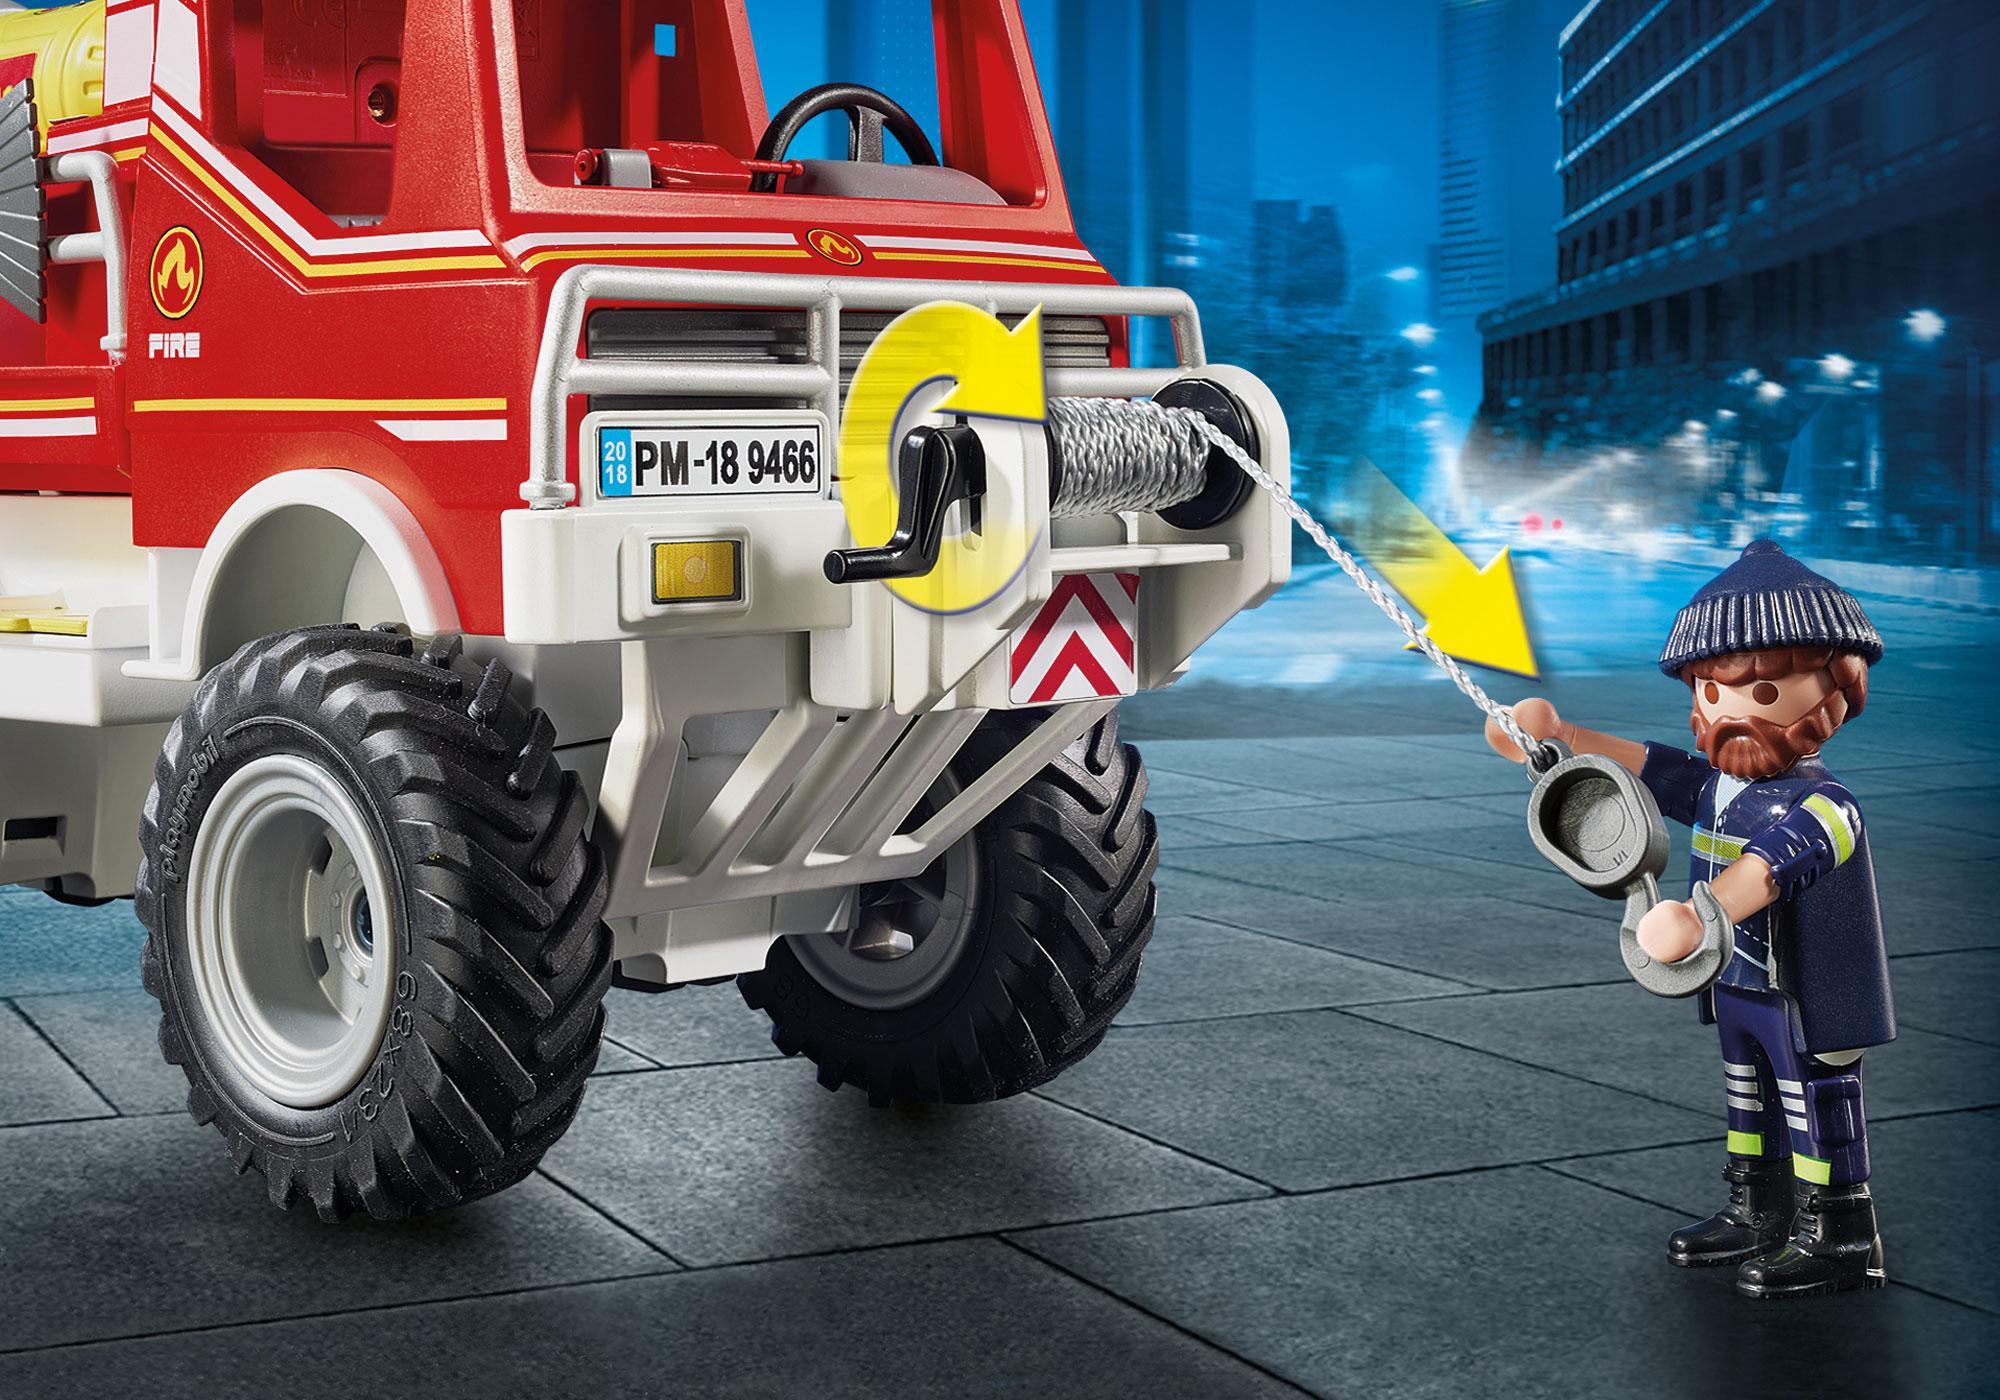 http://media.playmobil.com/i/playmobil/9466_product_extra1/Fire Truck